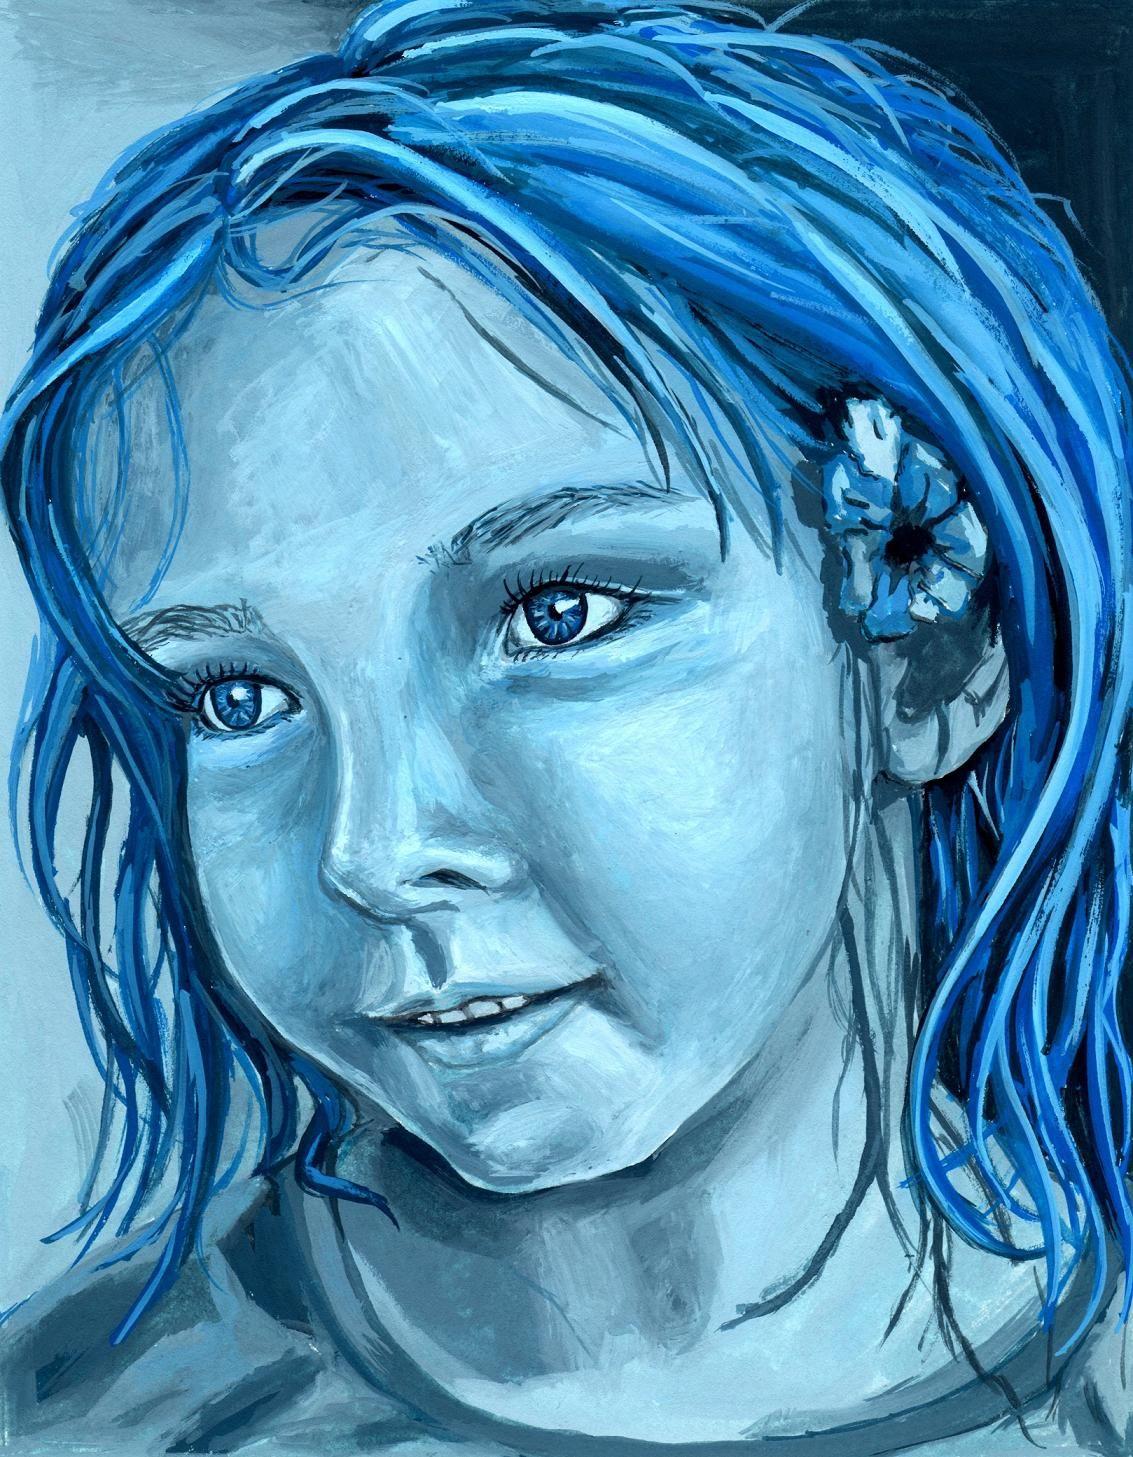 Design Monochromatic Painting monochromatic painting art education grade 6 term 1 figures painting